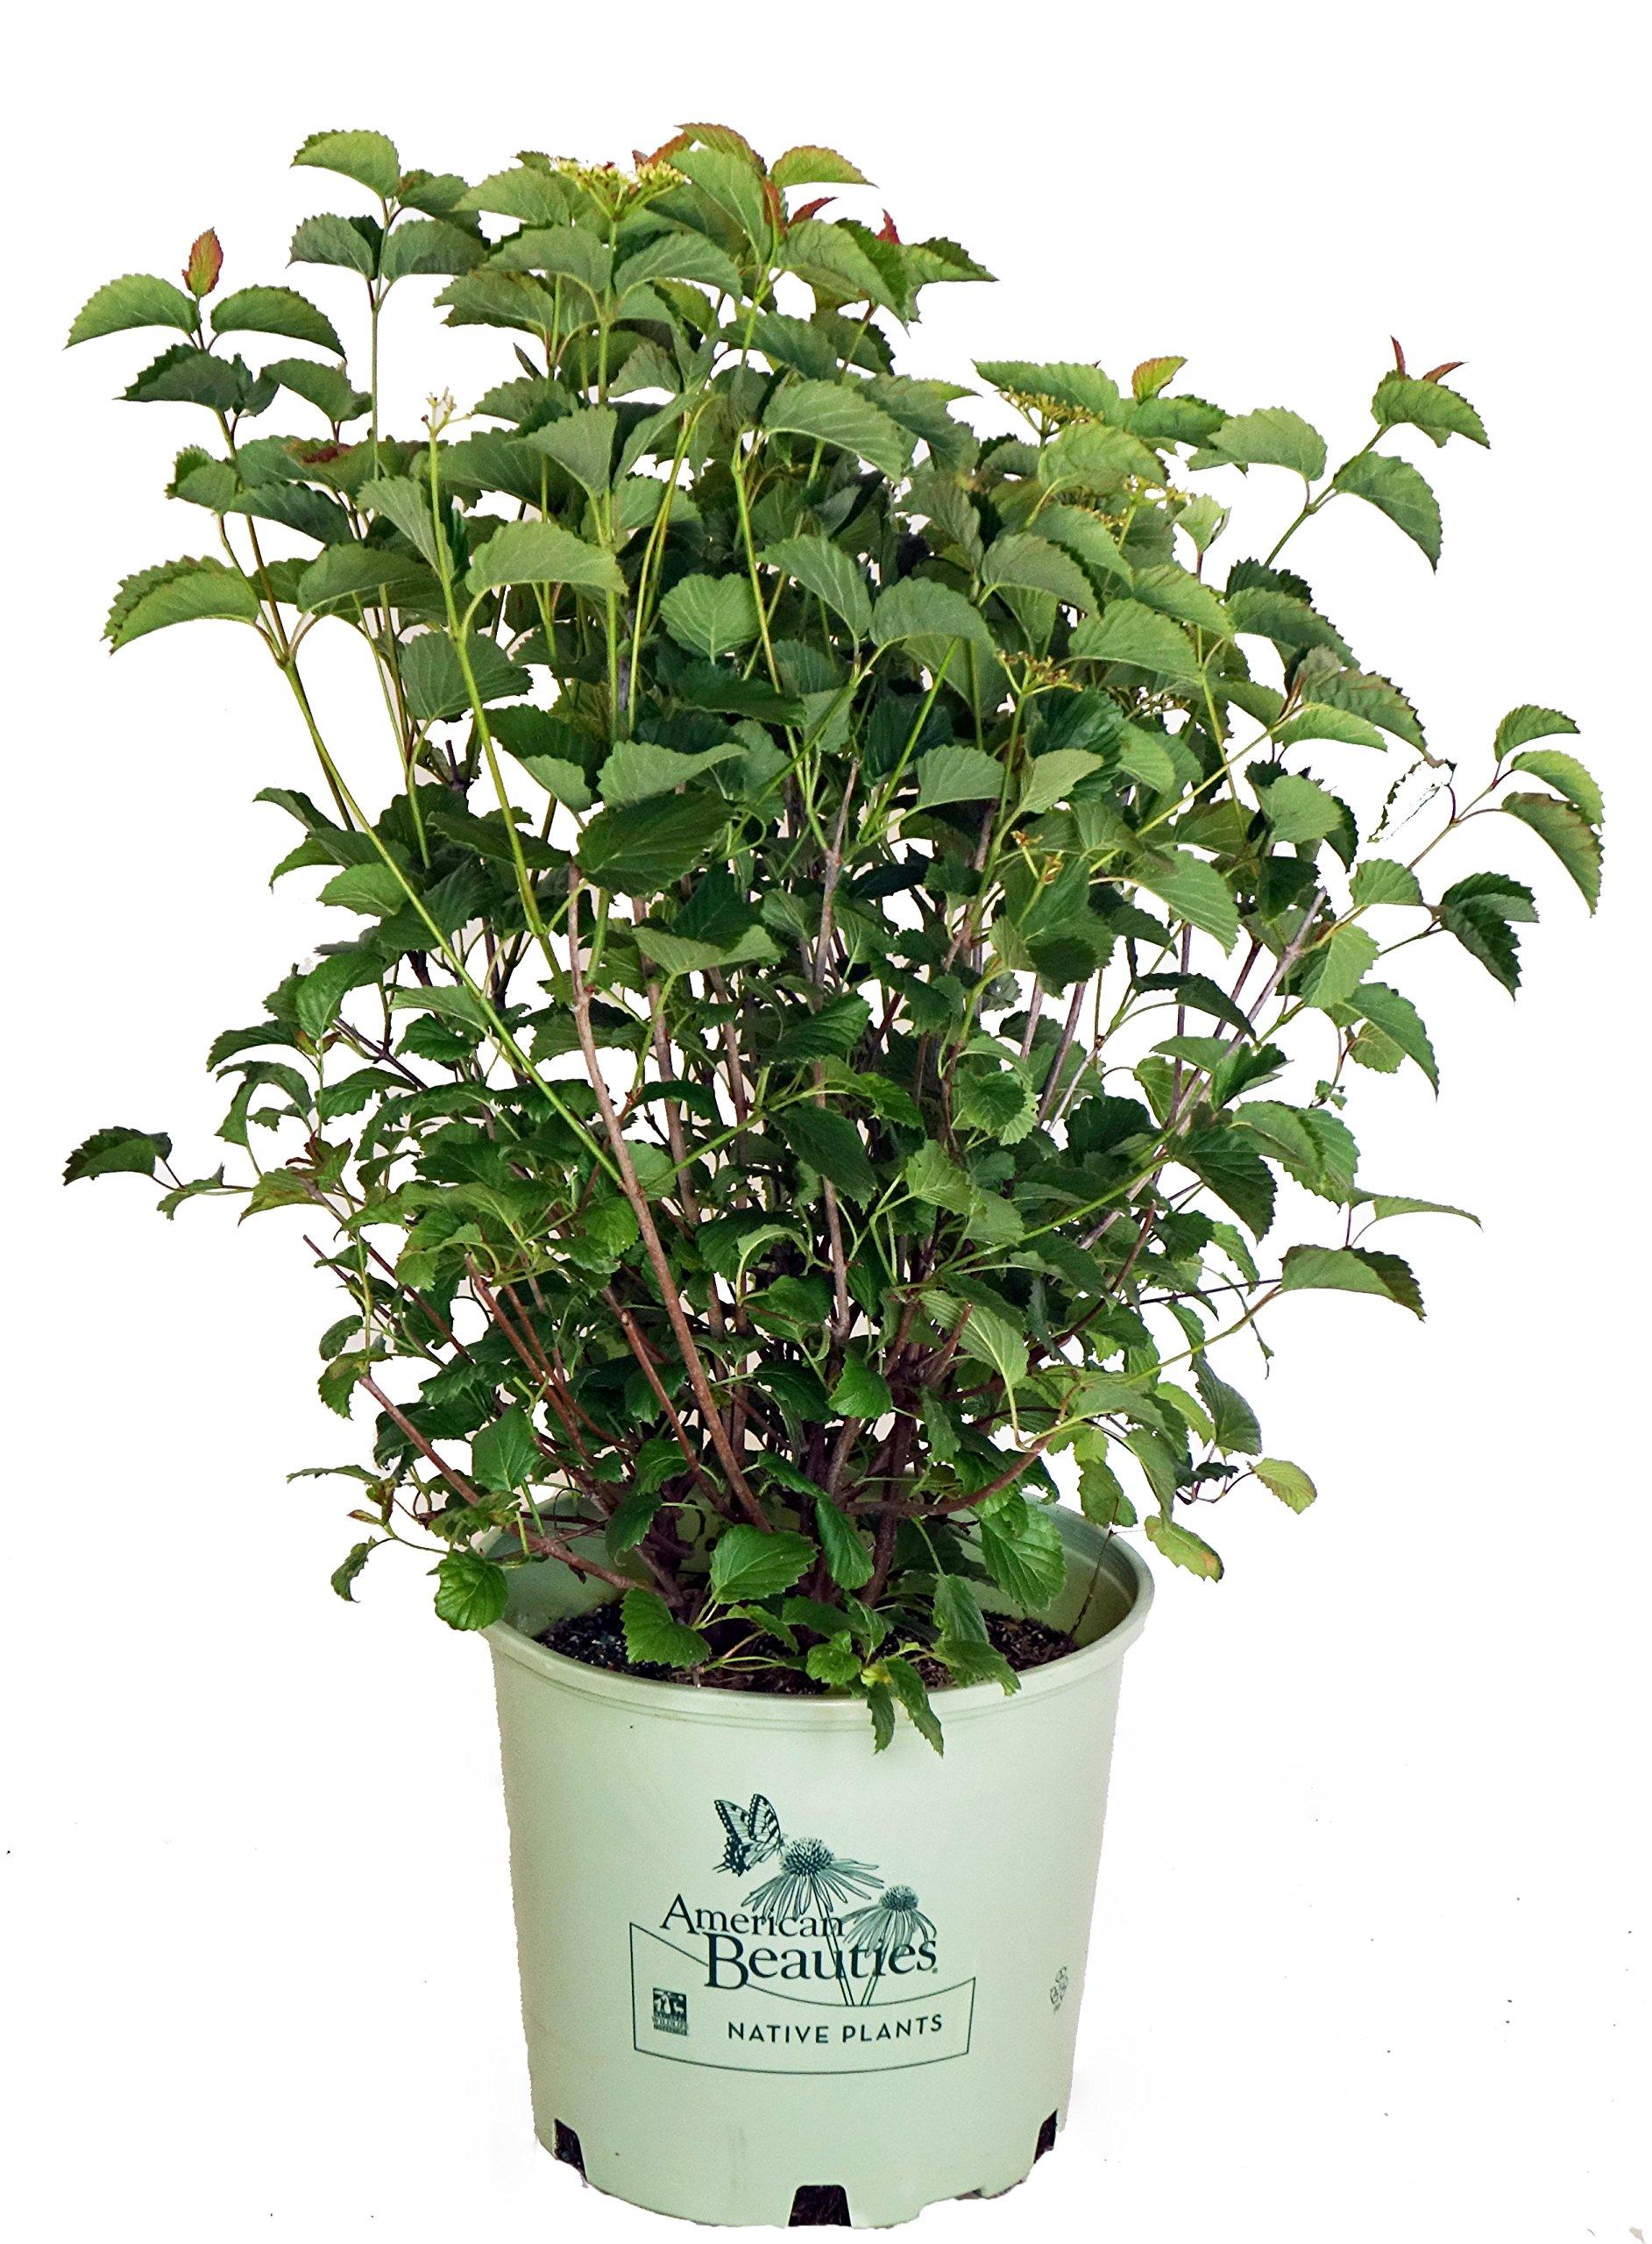 American Beauties Native Plants - Viburnum dentatum 'Blue Blaze' (Arrowwood) Shrub, white flowers with blue fruit, #3 - Size Container